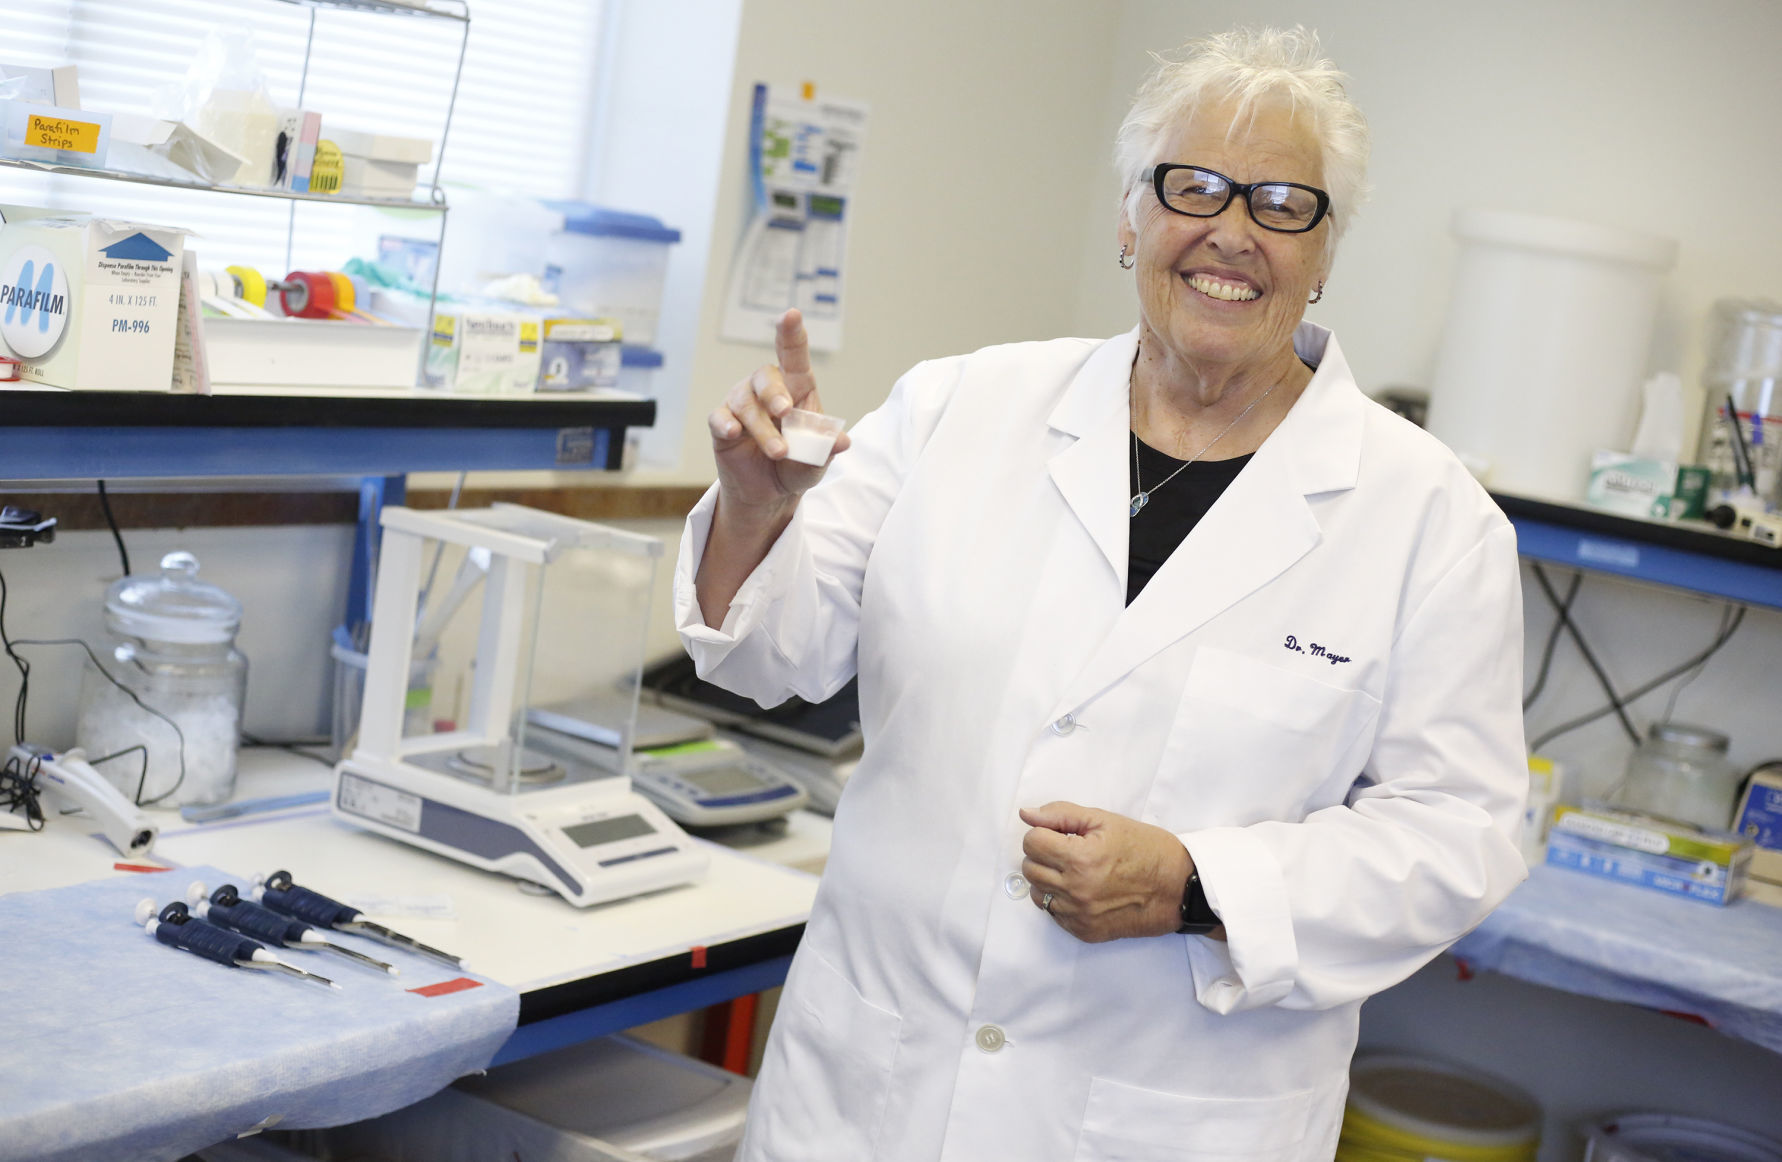 Loretta Mayer and Senestech Senestech sees lawsuits